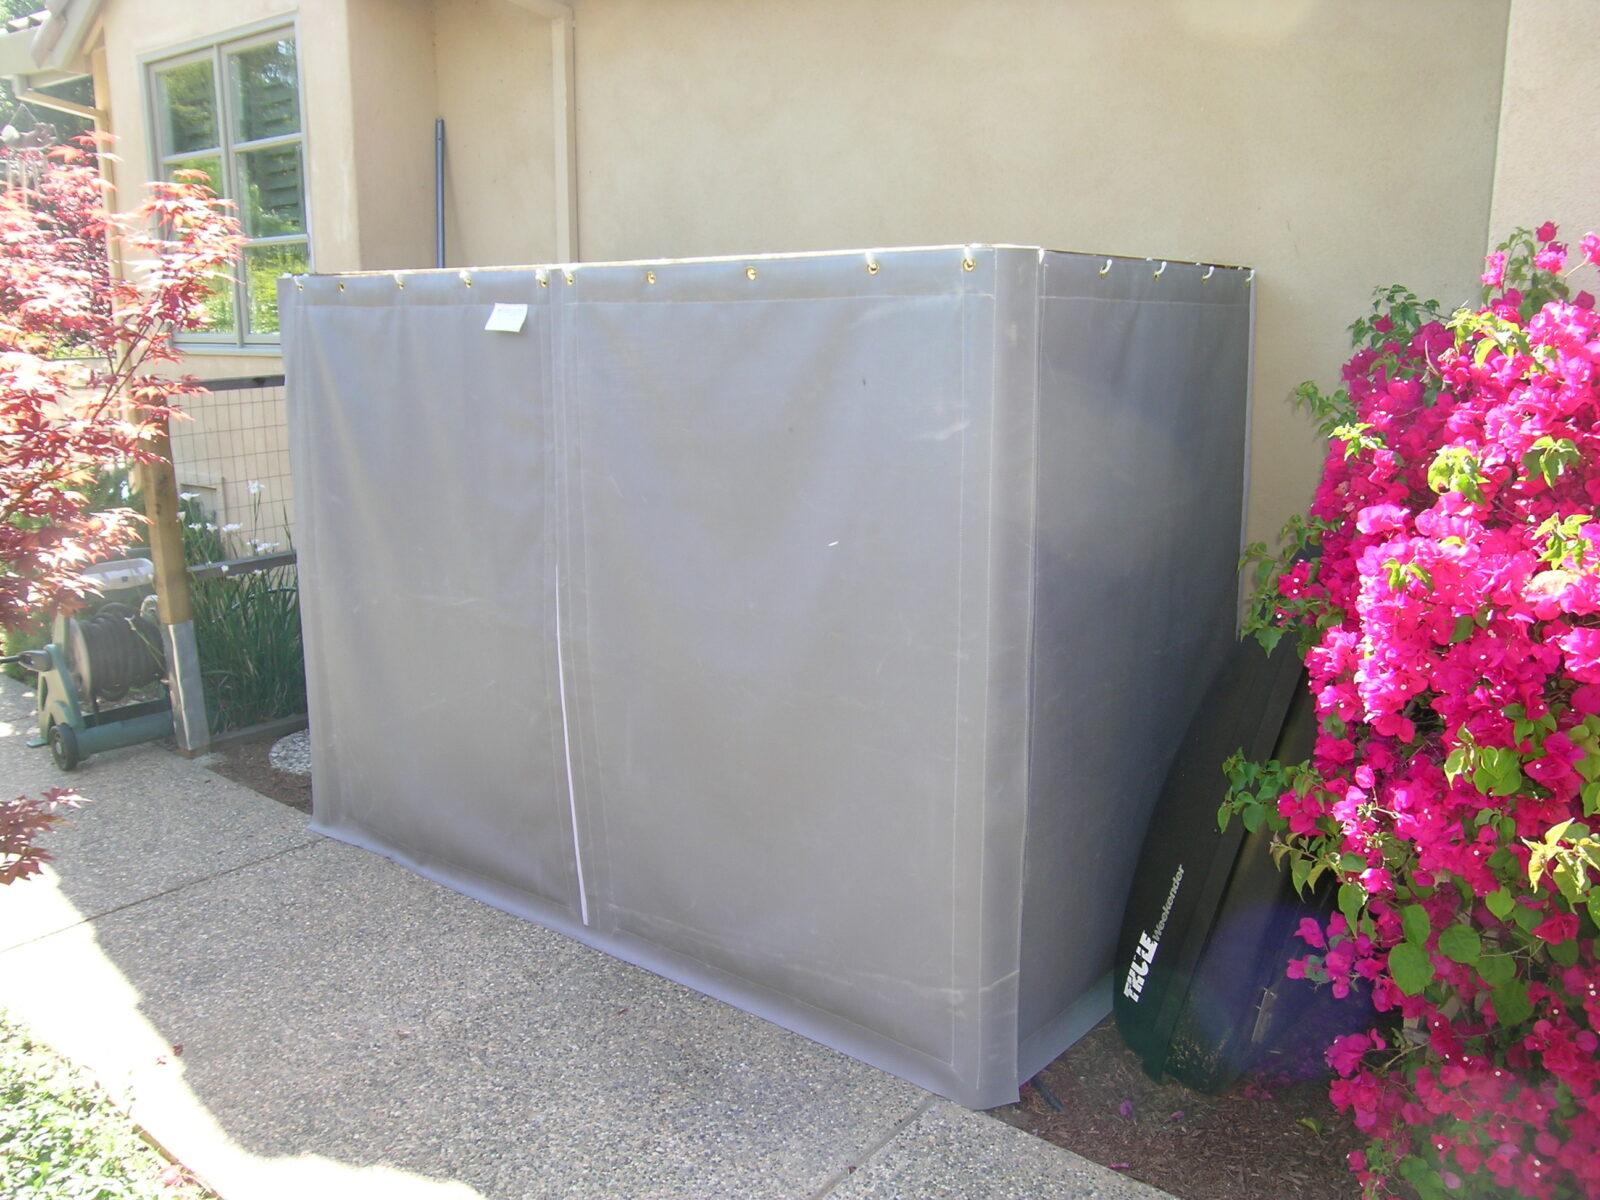 noise control blankets for loud AC unit